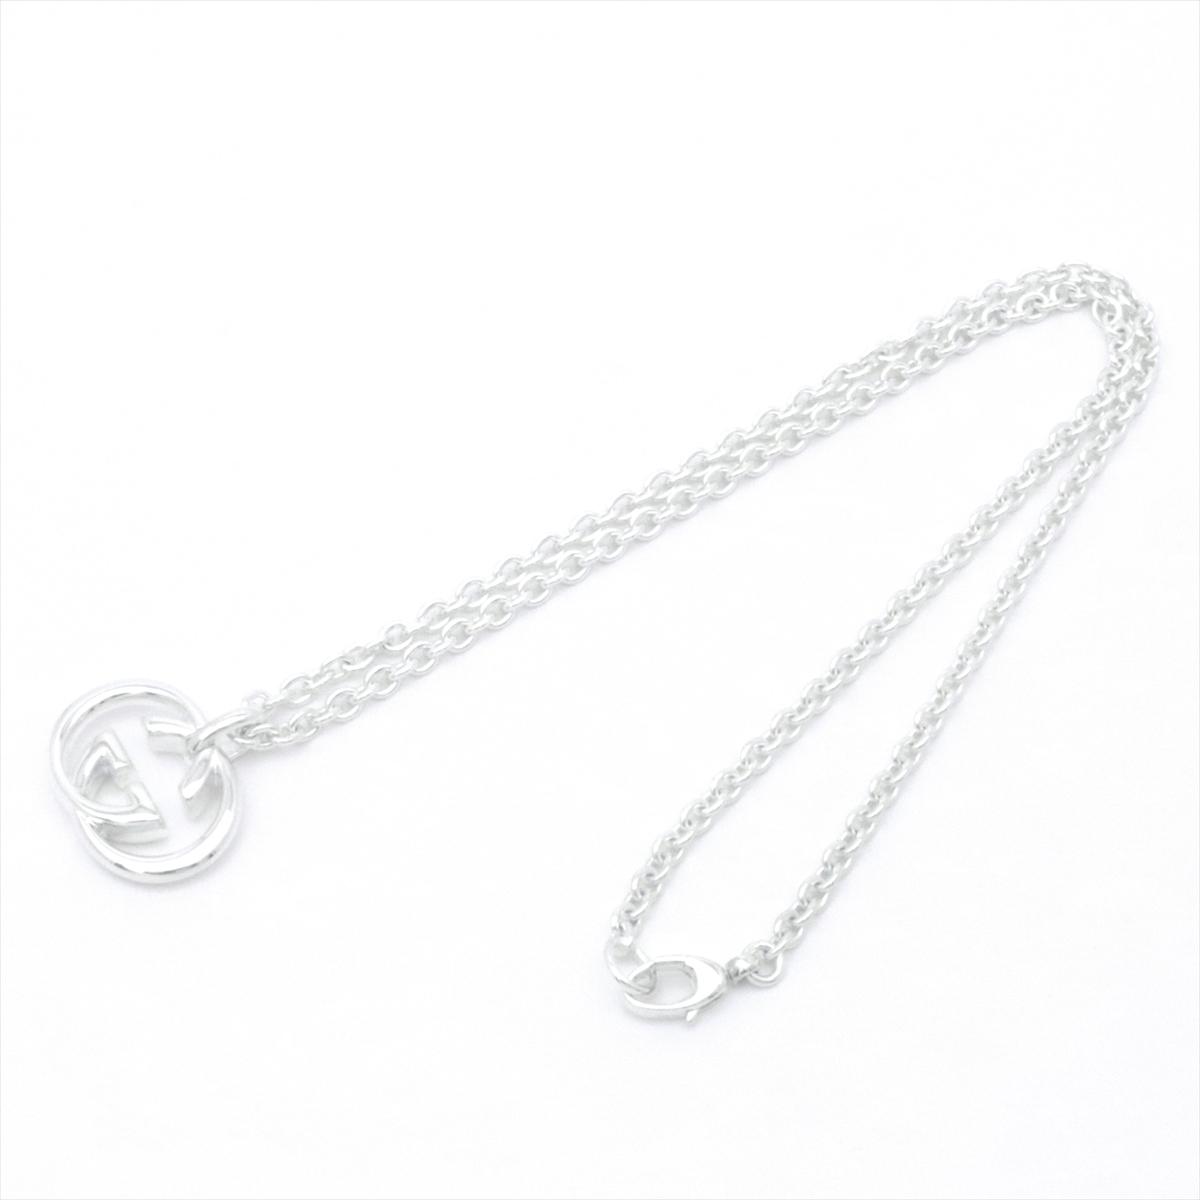 Karyon Gucci Jewelry Necklace Bracelet Pair Set Lady39s